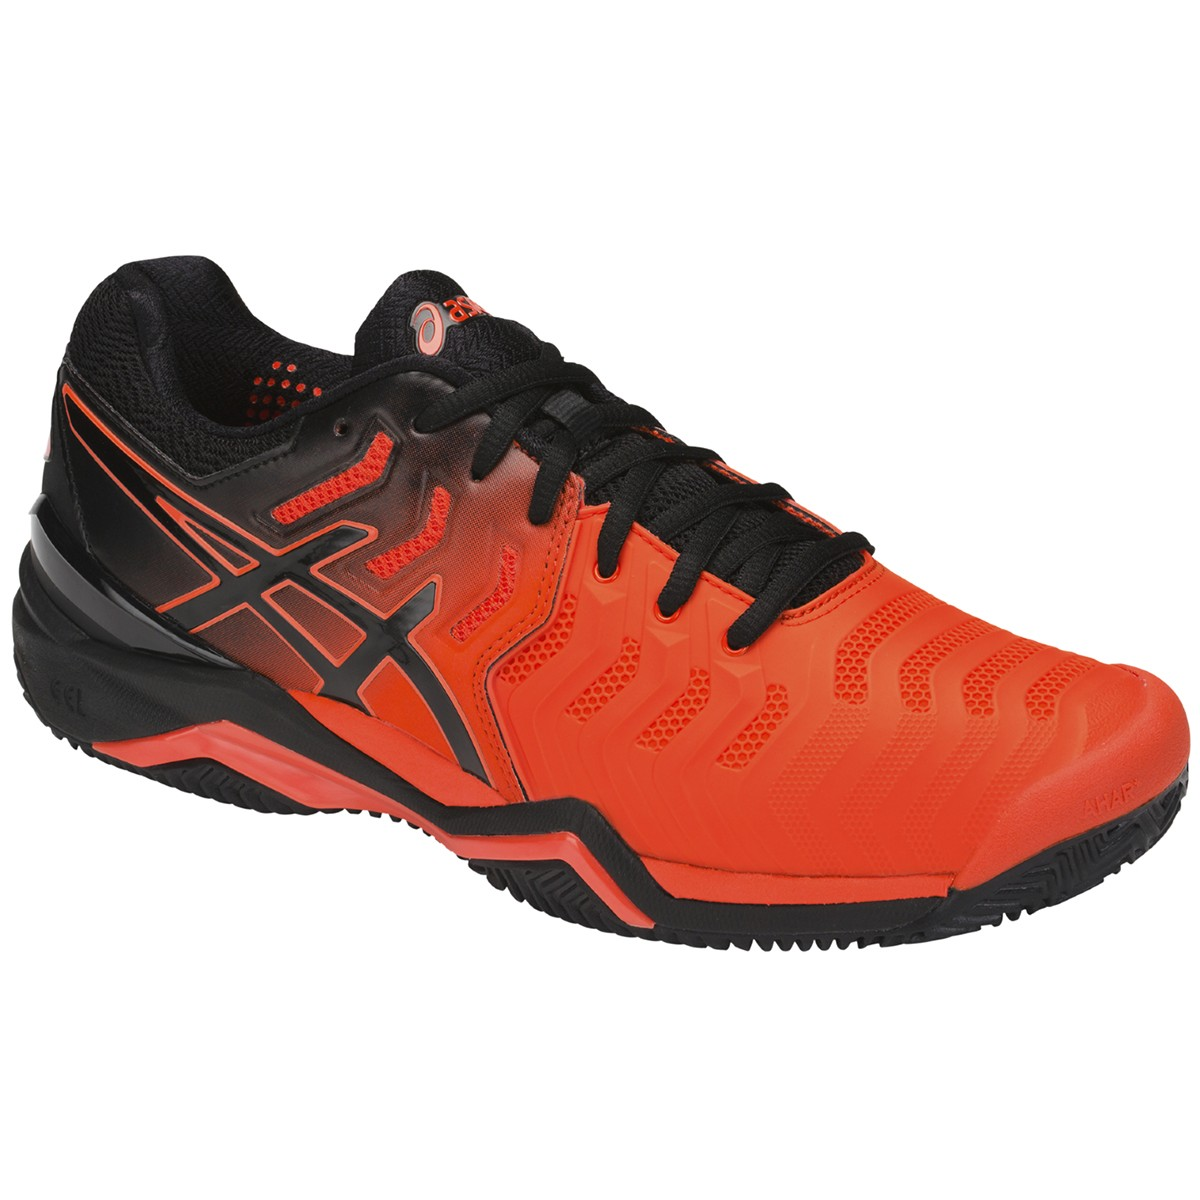 Asics Gel Resolution 7 Clay Court Shoes Tennispro